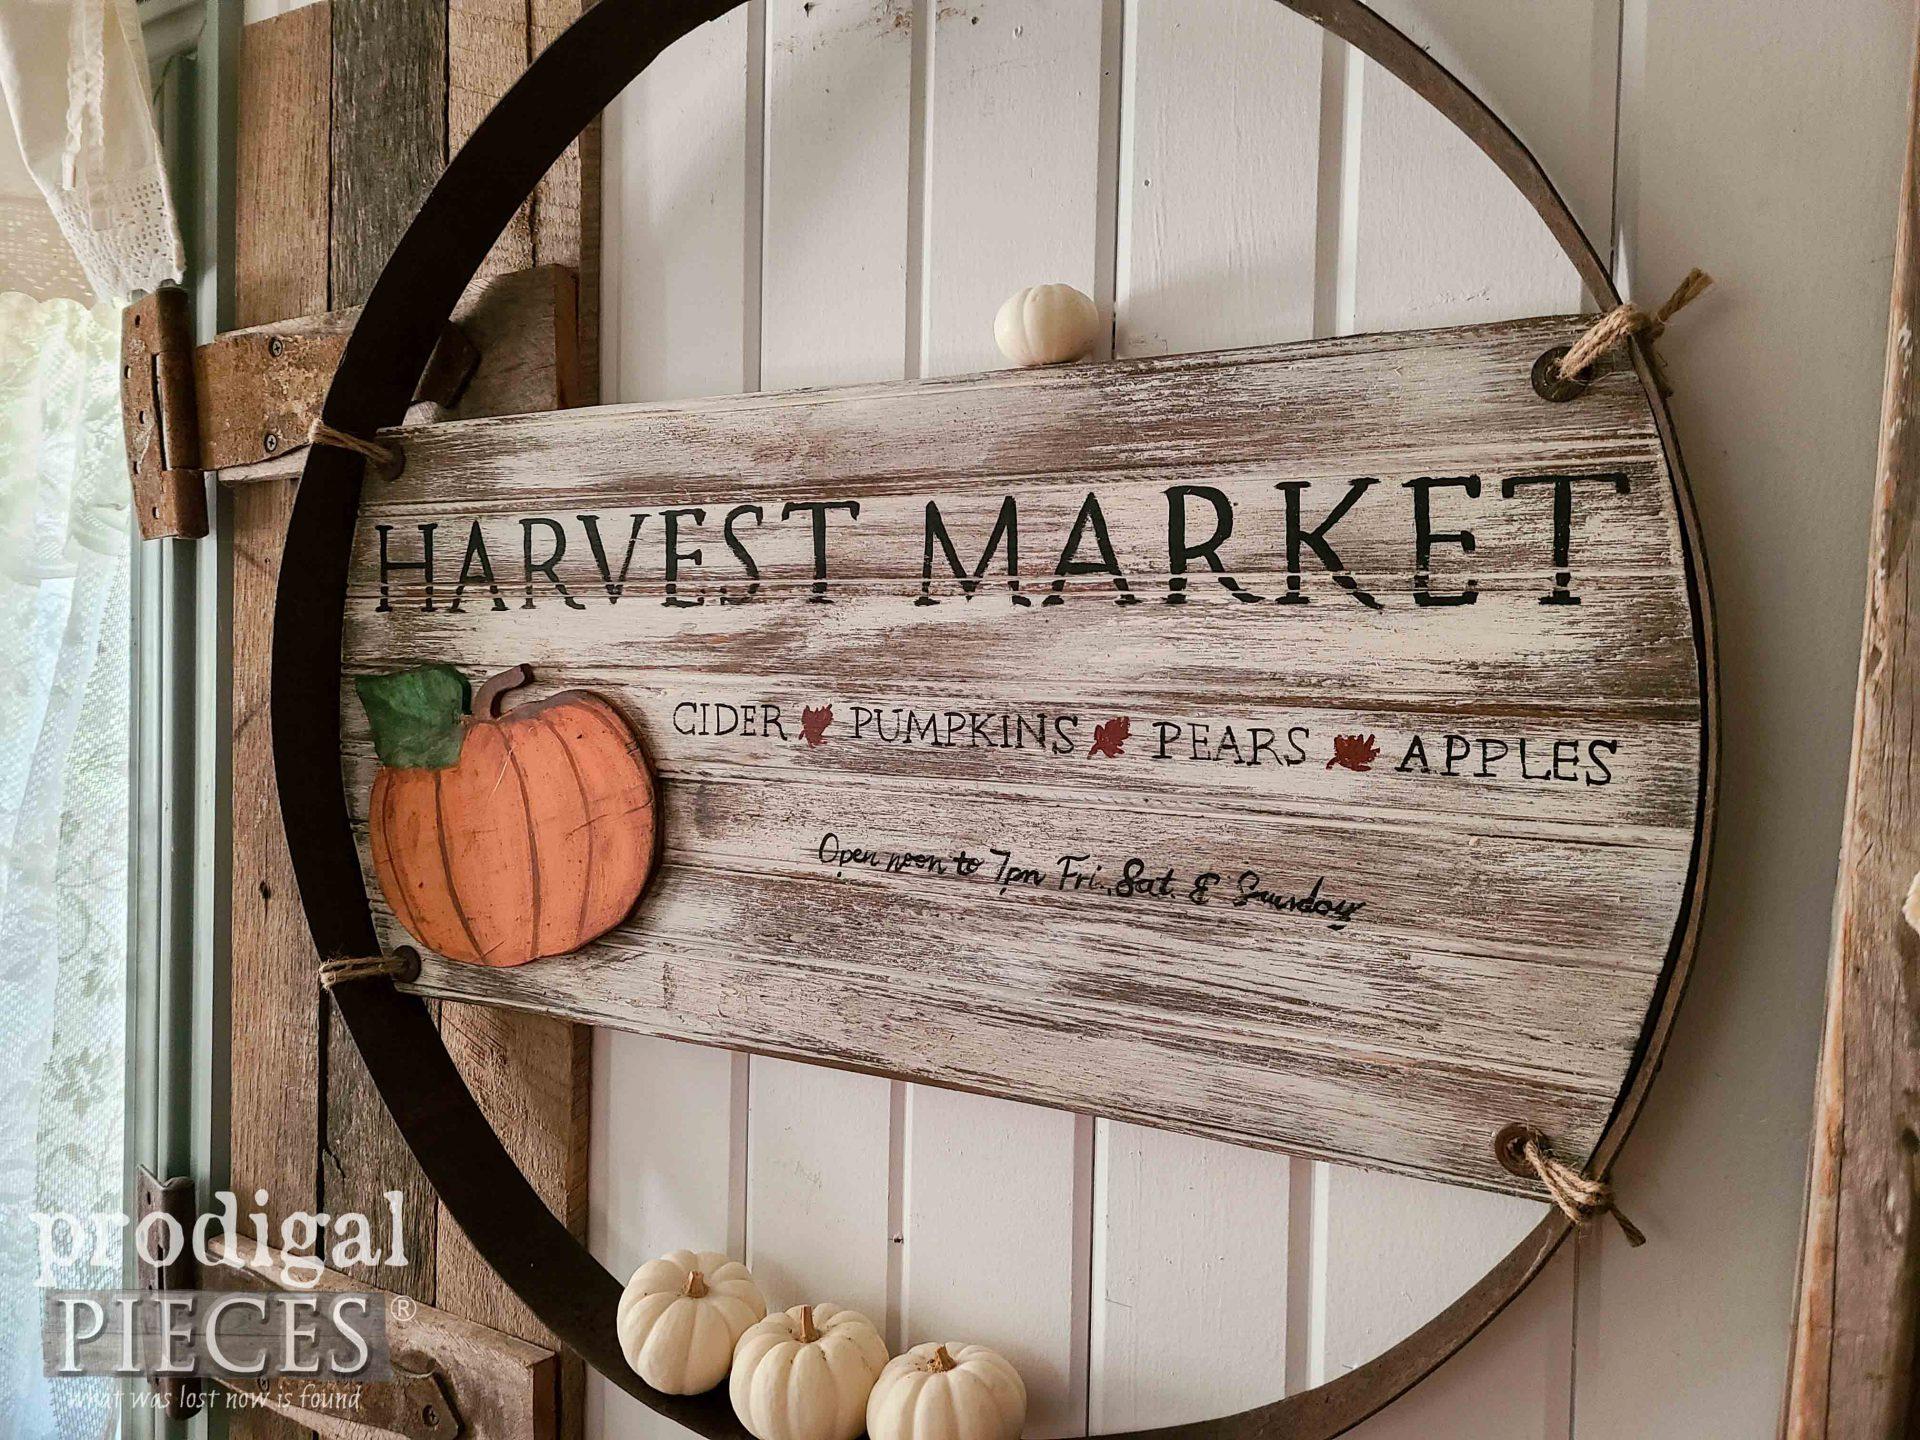 Farmhouse Fall Sign from Reclaimed Whiskey Barrel for Fall Wall Art by Larissa of Prodigal Pieces | prodigalpieces.com #prodigalpieces #reclaimed #fall #autumn #pumpkin #handmade #art